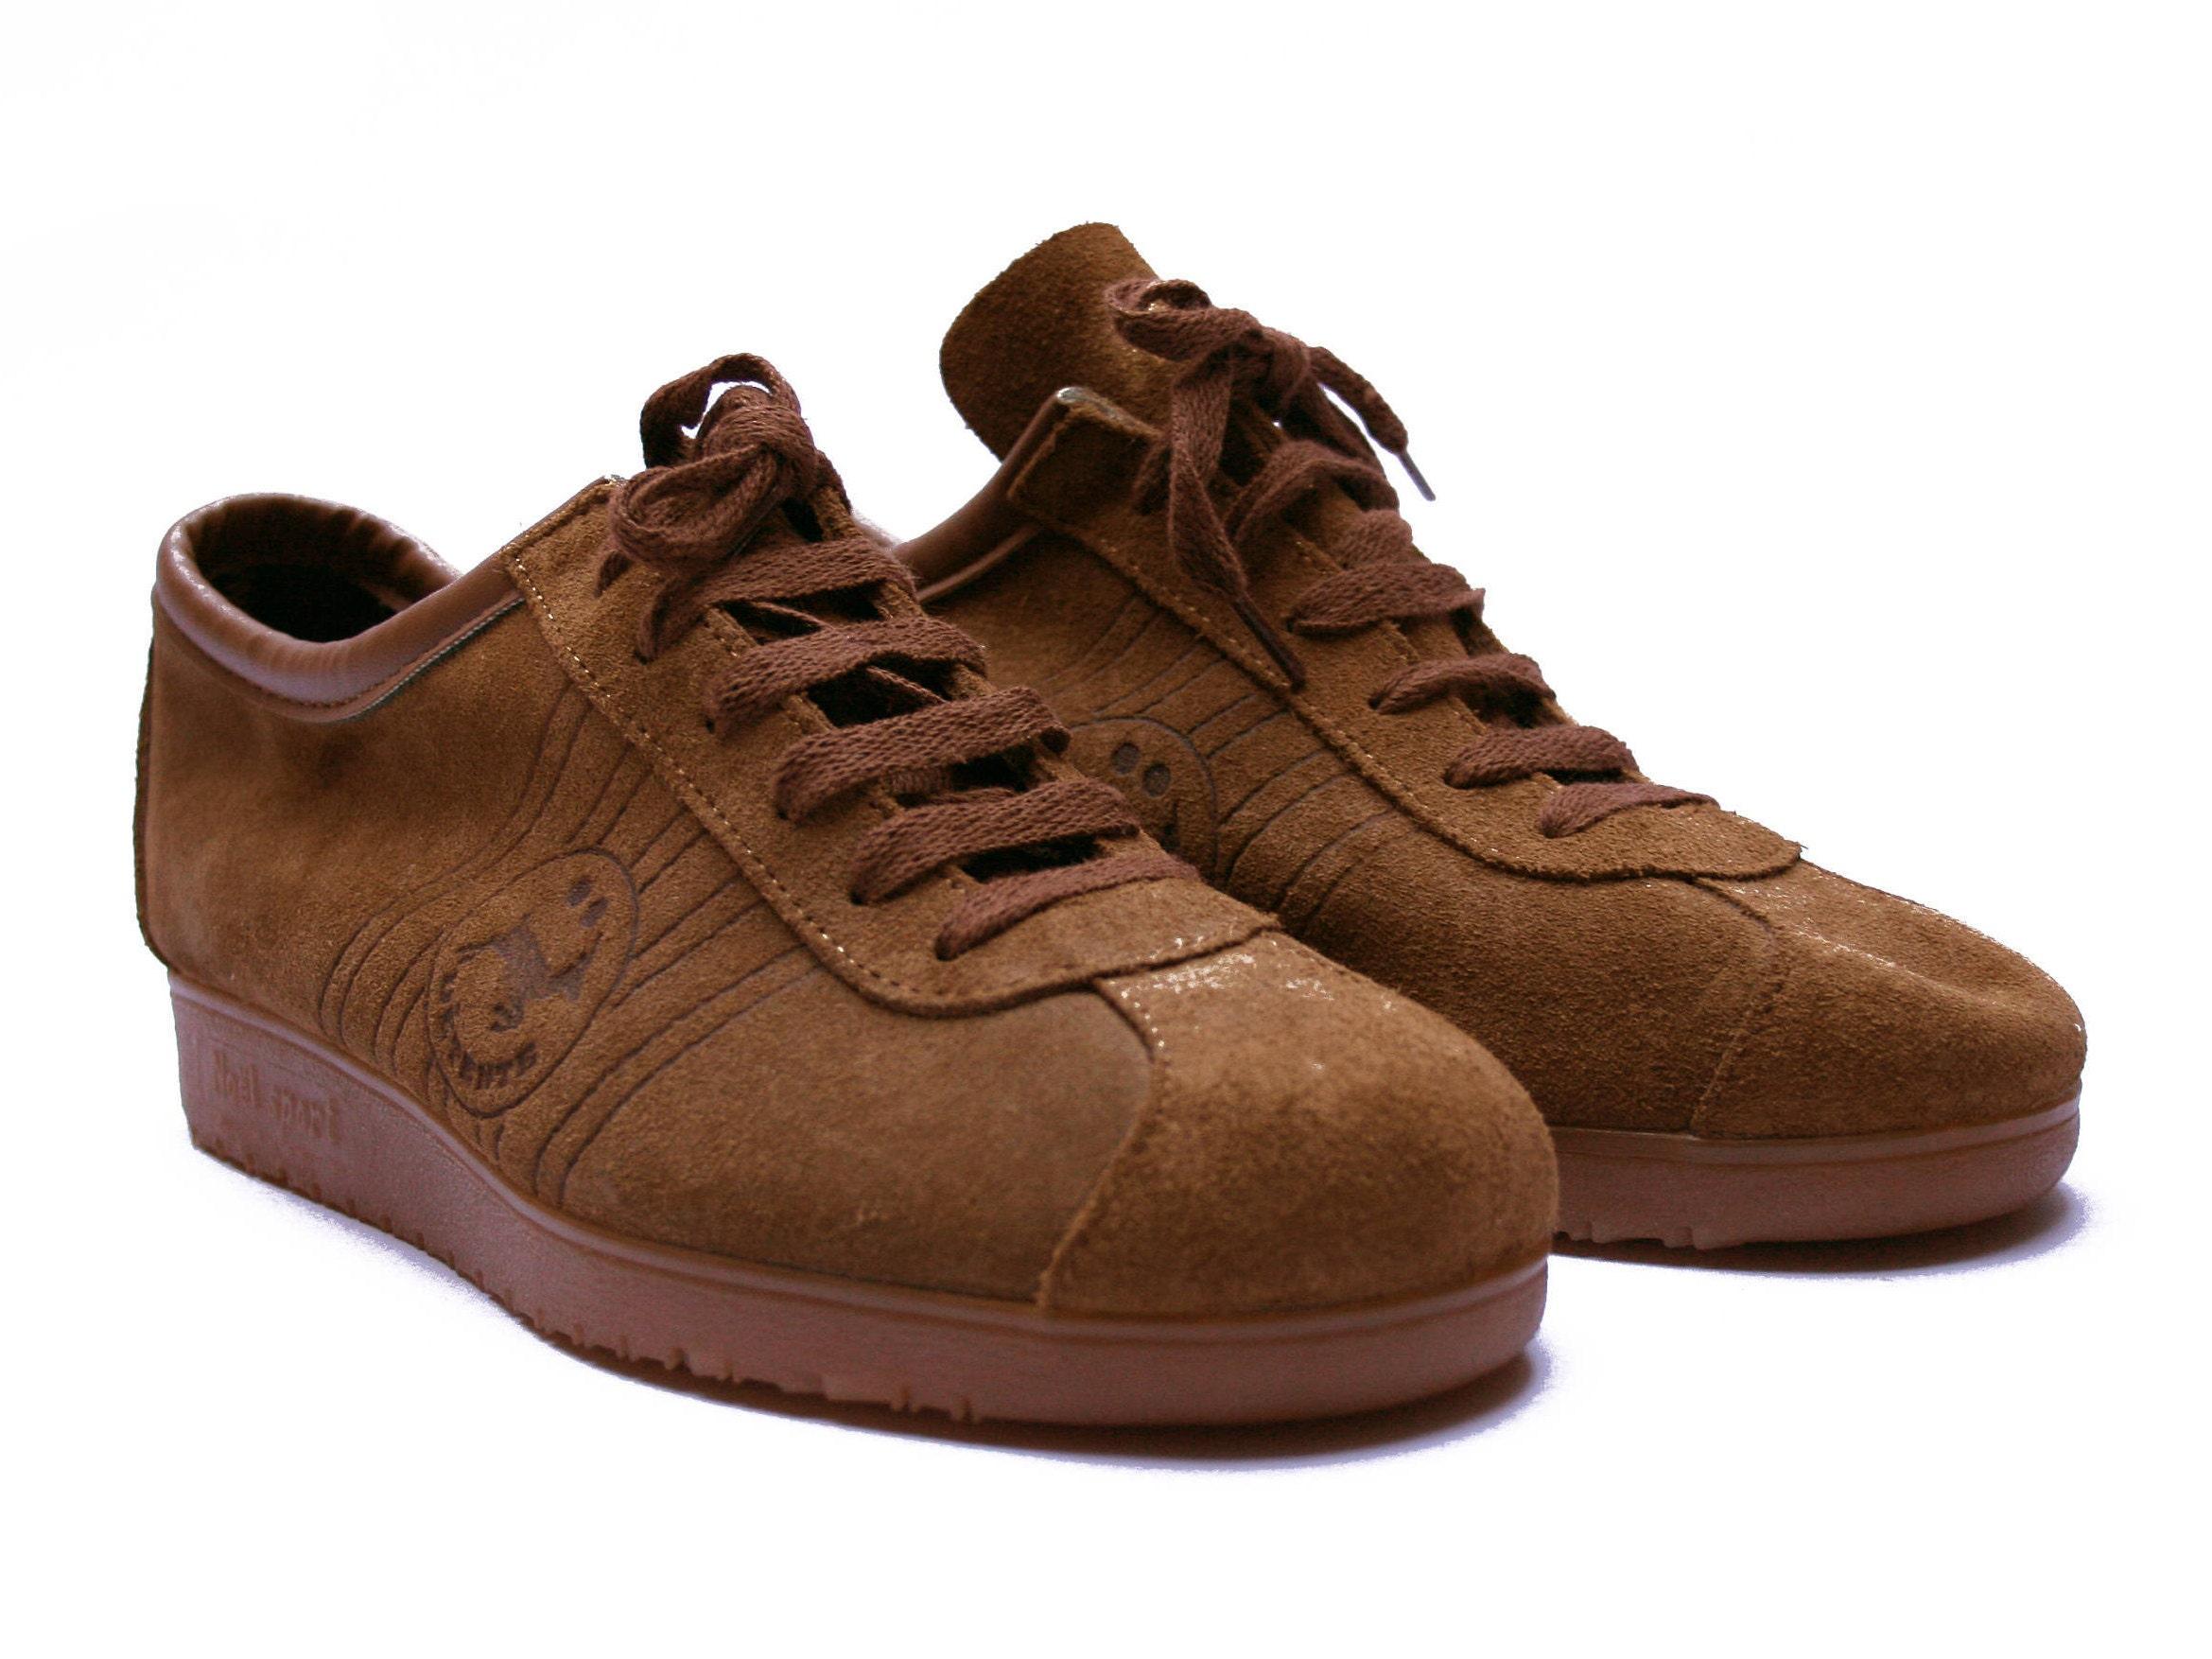 Chaussures Ganga années NOEL Ganga neuves 80 vintage Ganga Baskets q5fUx4w0